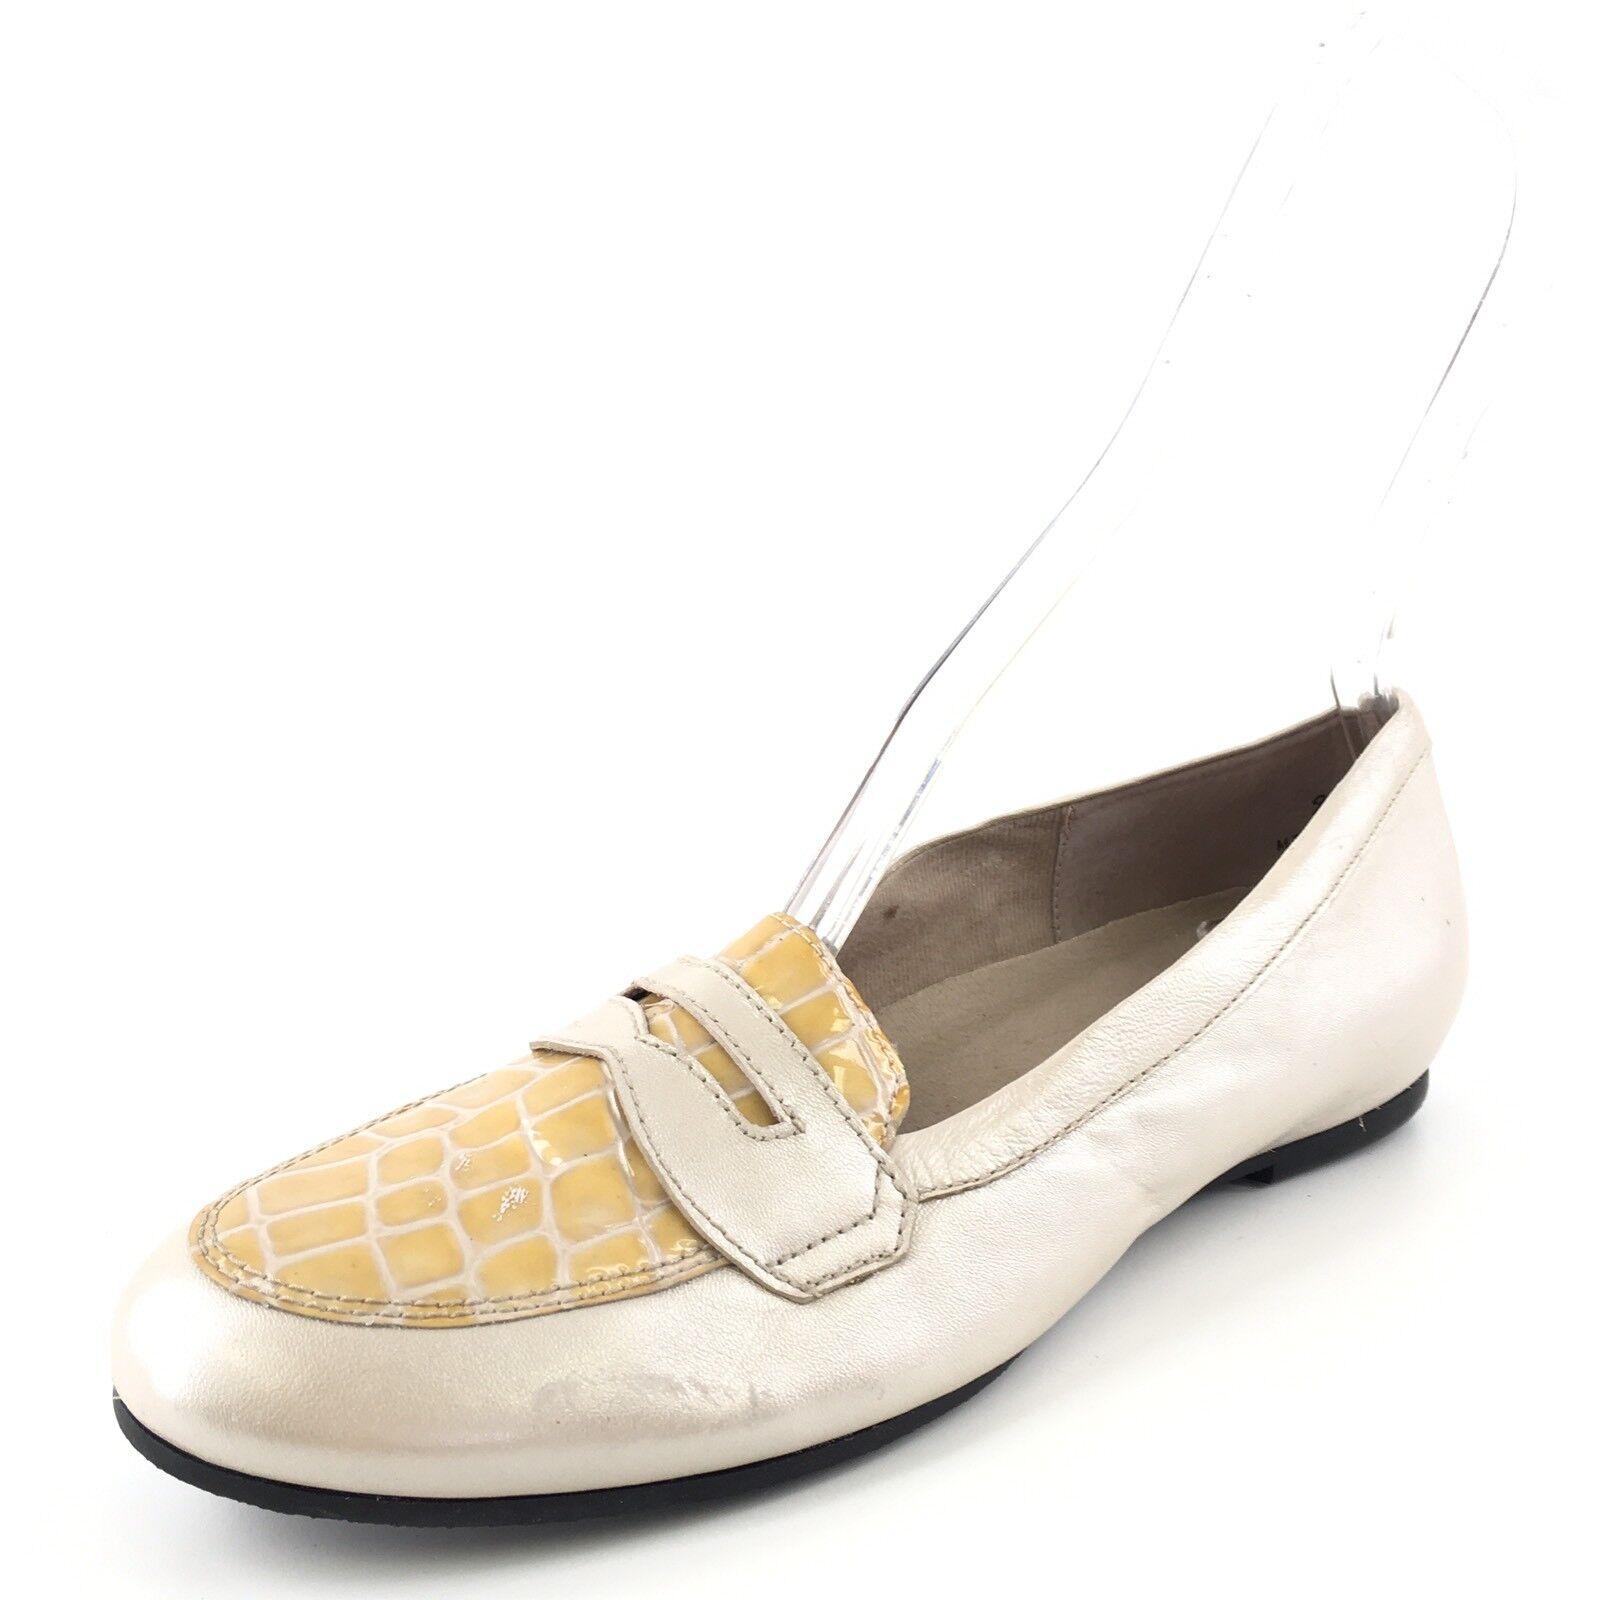 Munro American Carrie Bone Leather Bone Croc Penny Loafers Womens Size 9.5 N